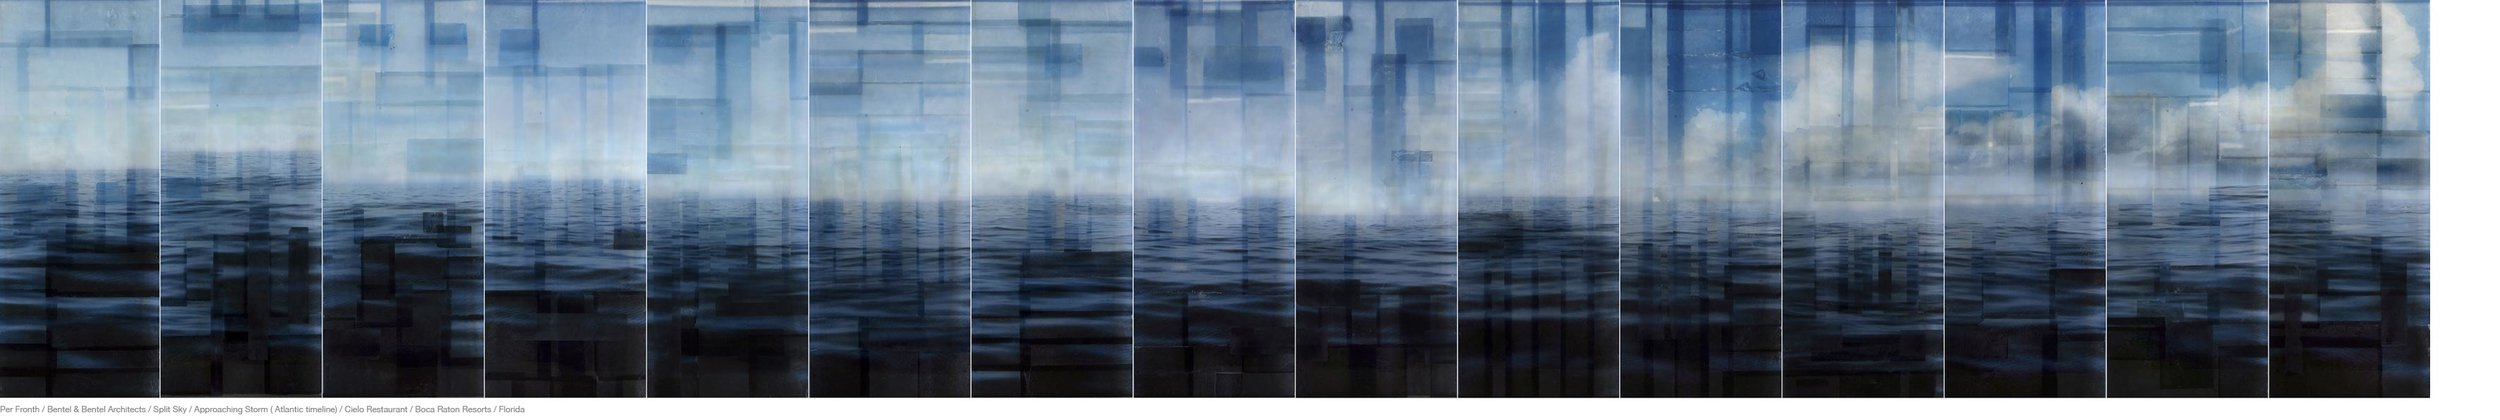 Per Fronth / Bentel & Bentel Architects / Split Sky / Approaching Storm ( Atlantic Timeline ) / Cielo Resturant / Boca Raton Resorts / Florida